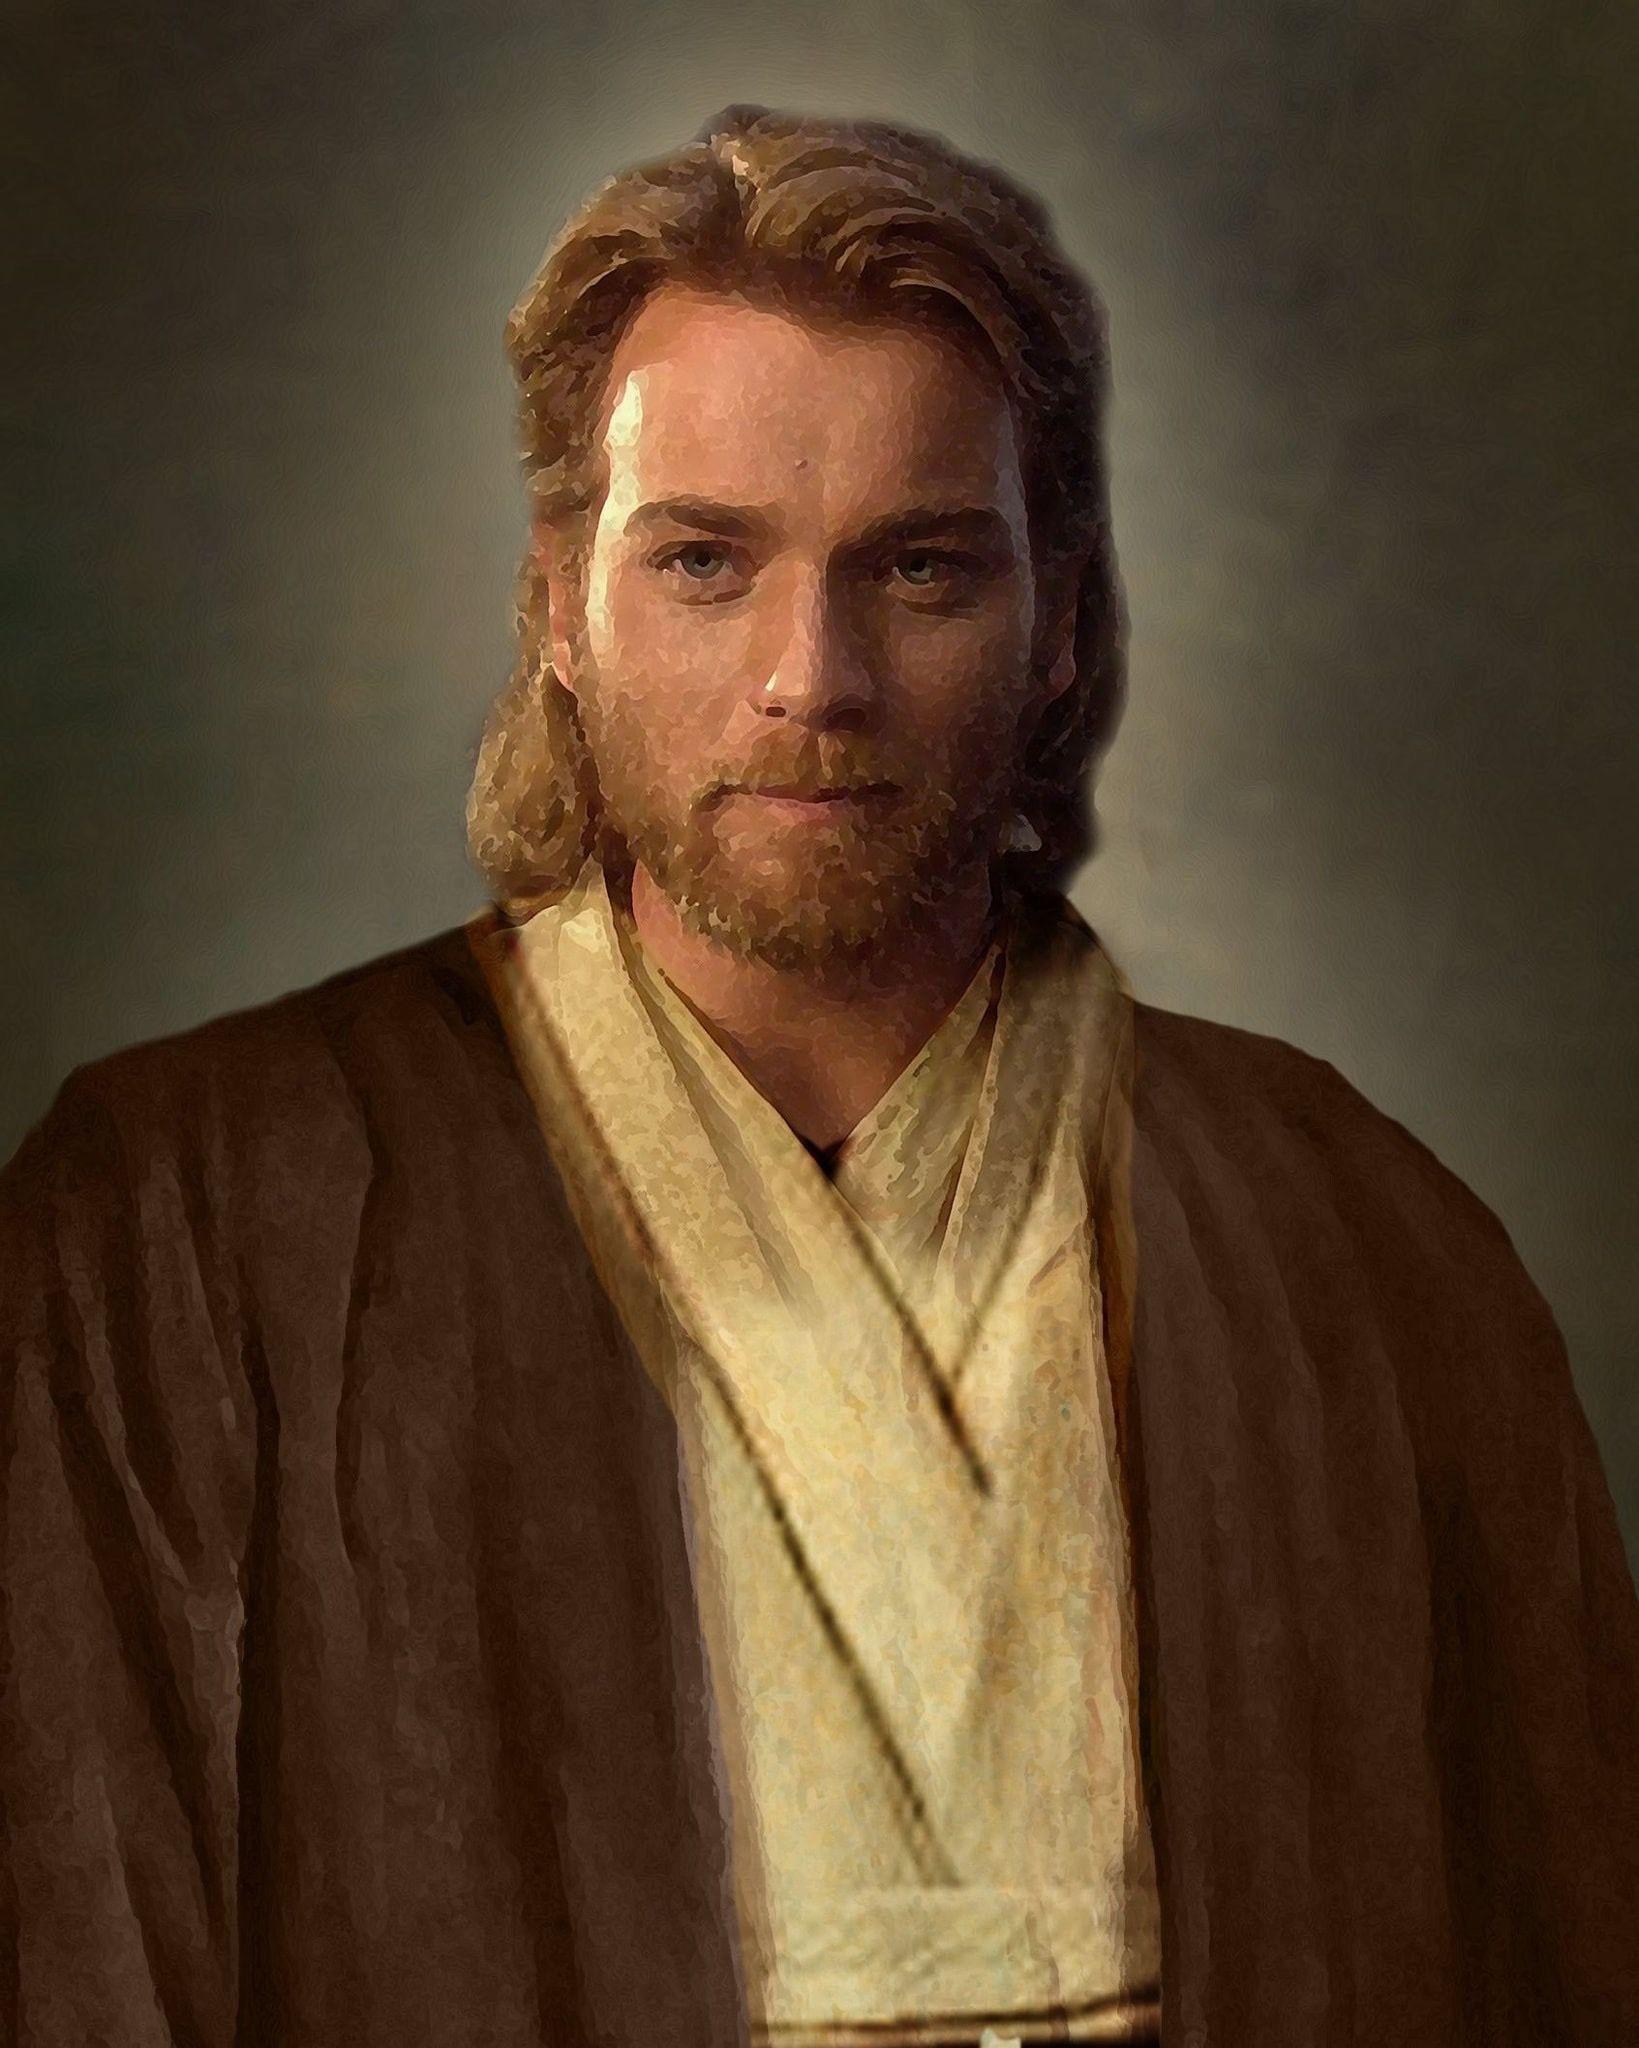 Pin By Lina Contreras On Star Wars 3 Star Wars Obi Wan Obi Wan Kenobi Funny Obi Wan